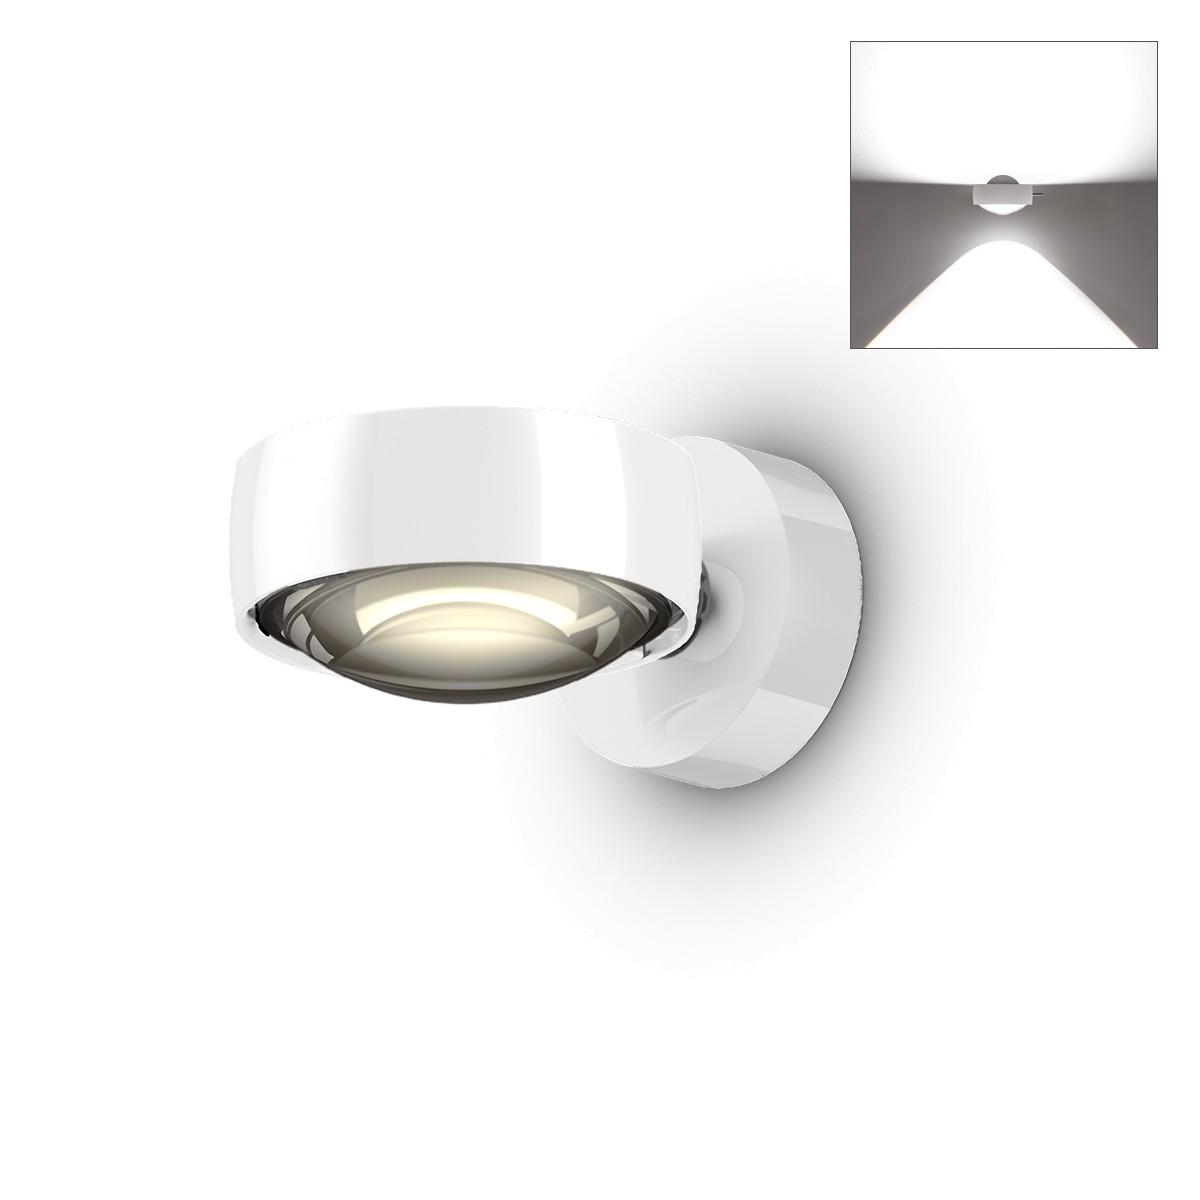 Occhio Sento E LED verticale up Wandleuchte, 2700 K, Chrom / weiß glänzend